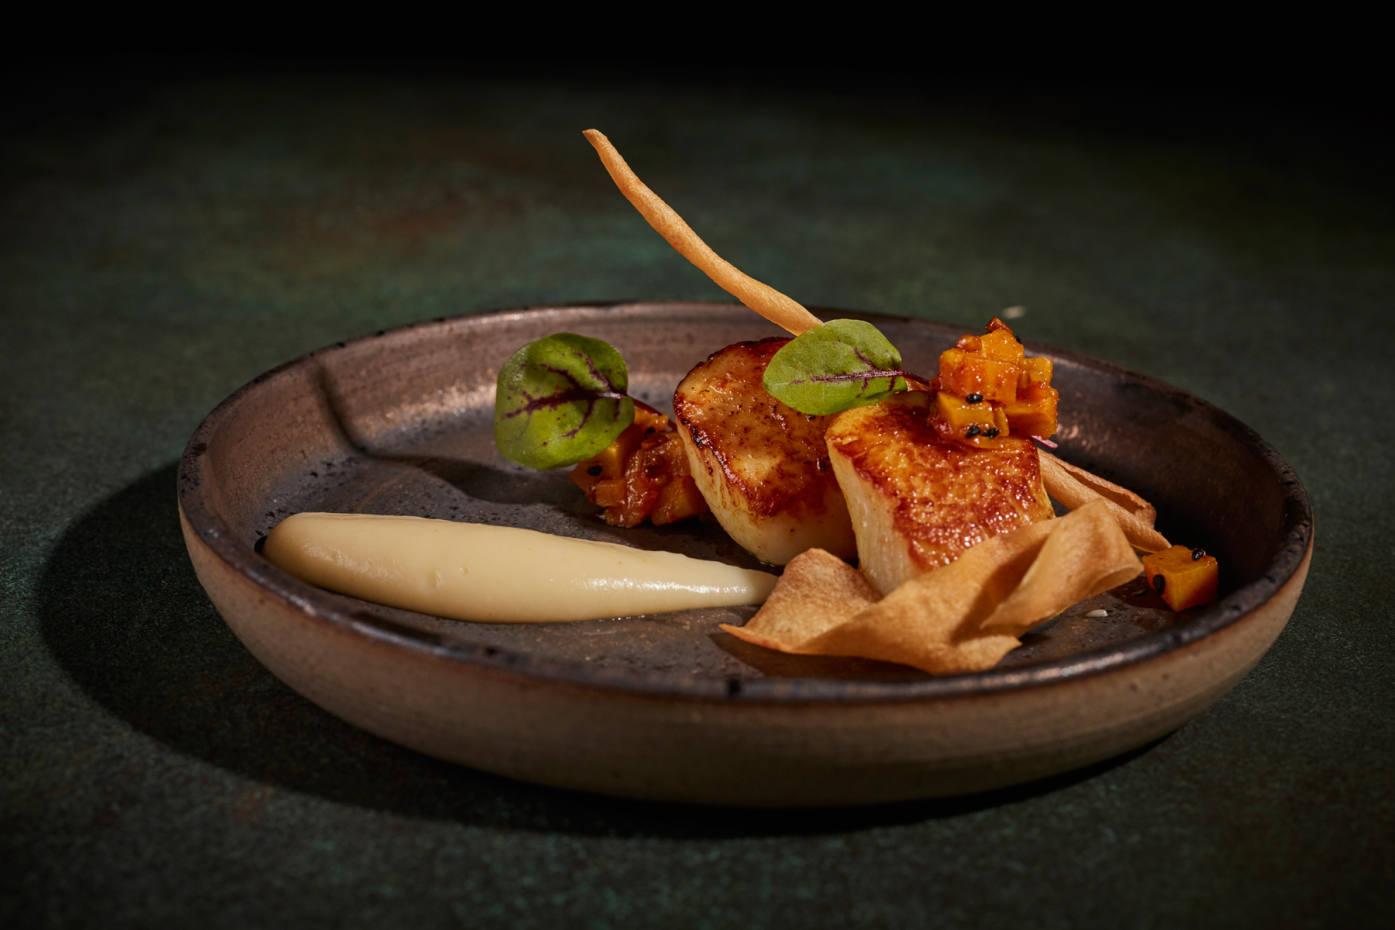 Kanishka's seared scallops with Naga chilli and cauliflower